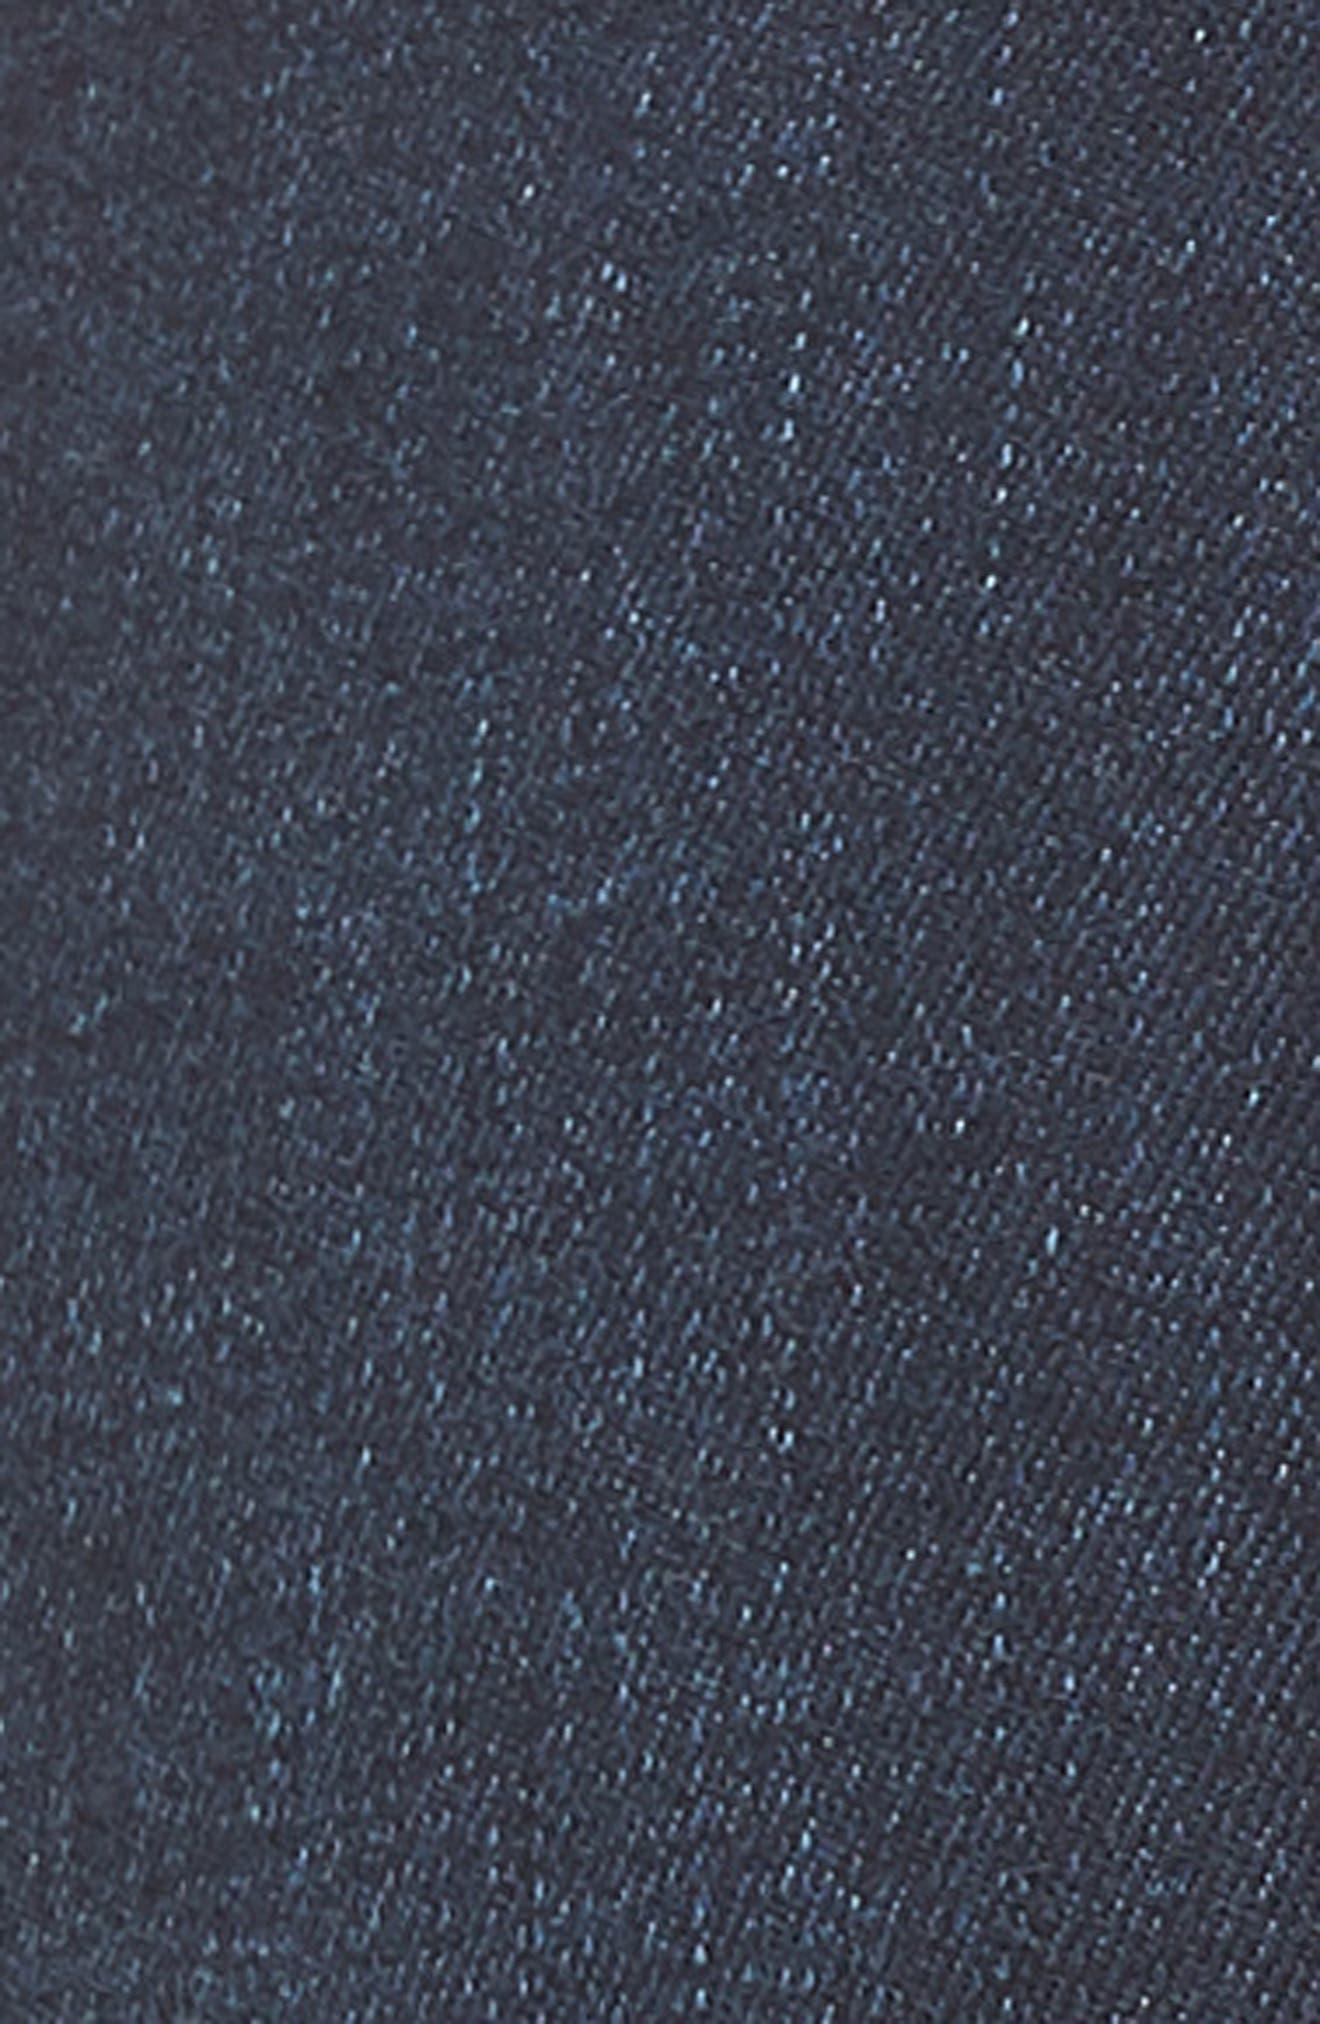 Ankle Skinny Jeans,                             Alternate thumbnail 5, color,                             Dark Wash